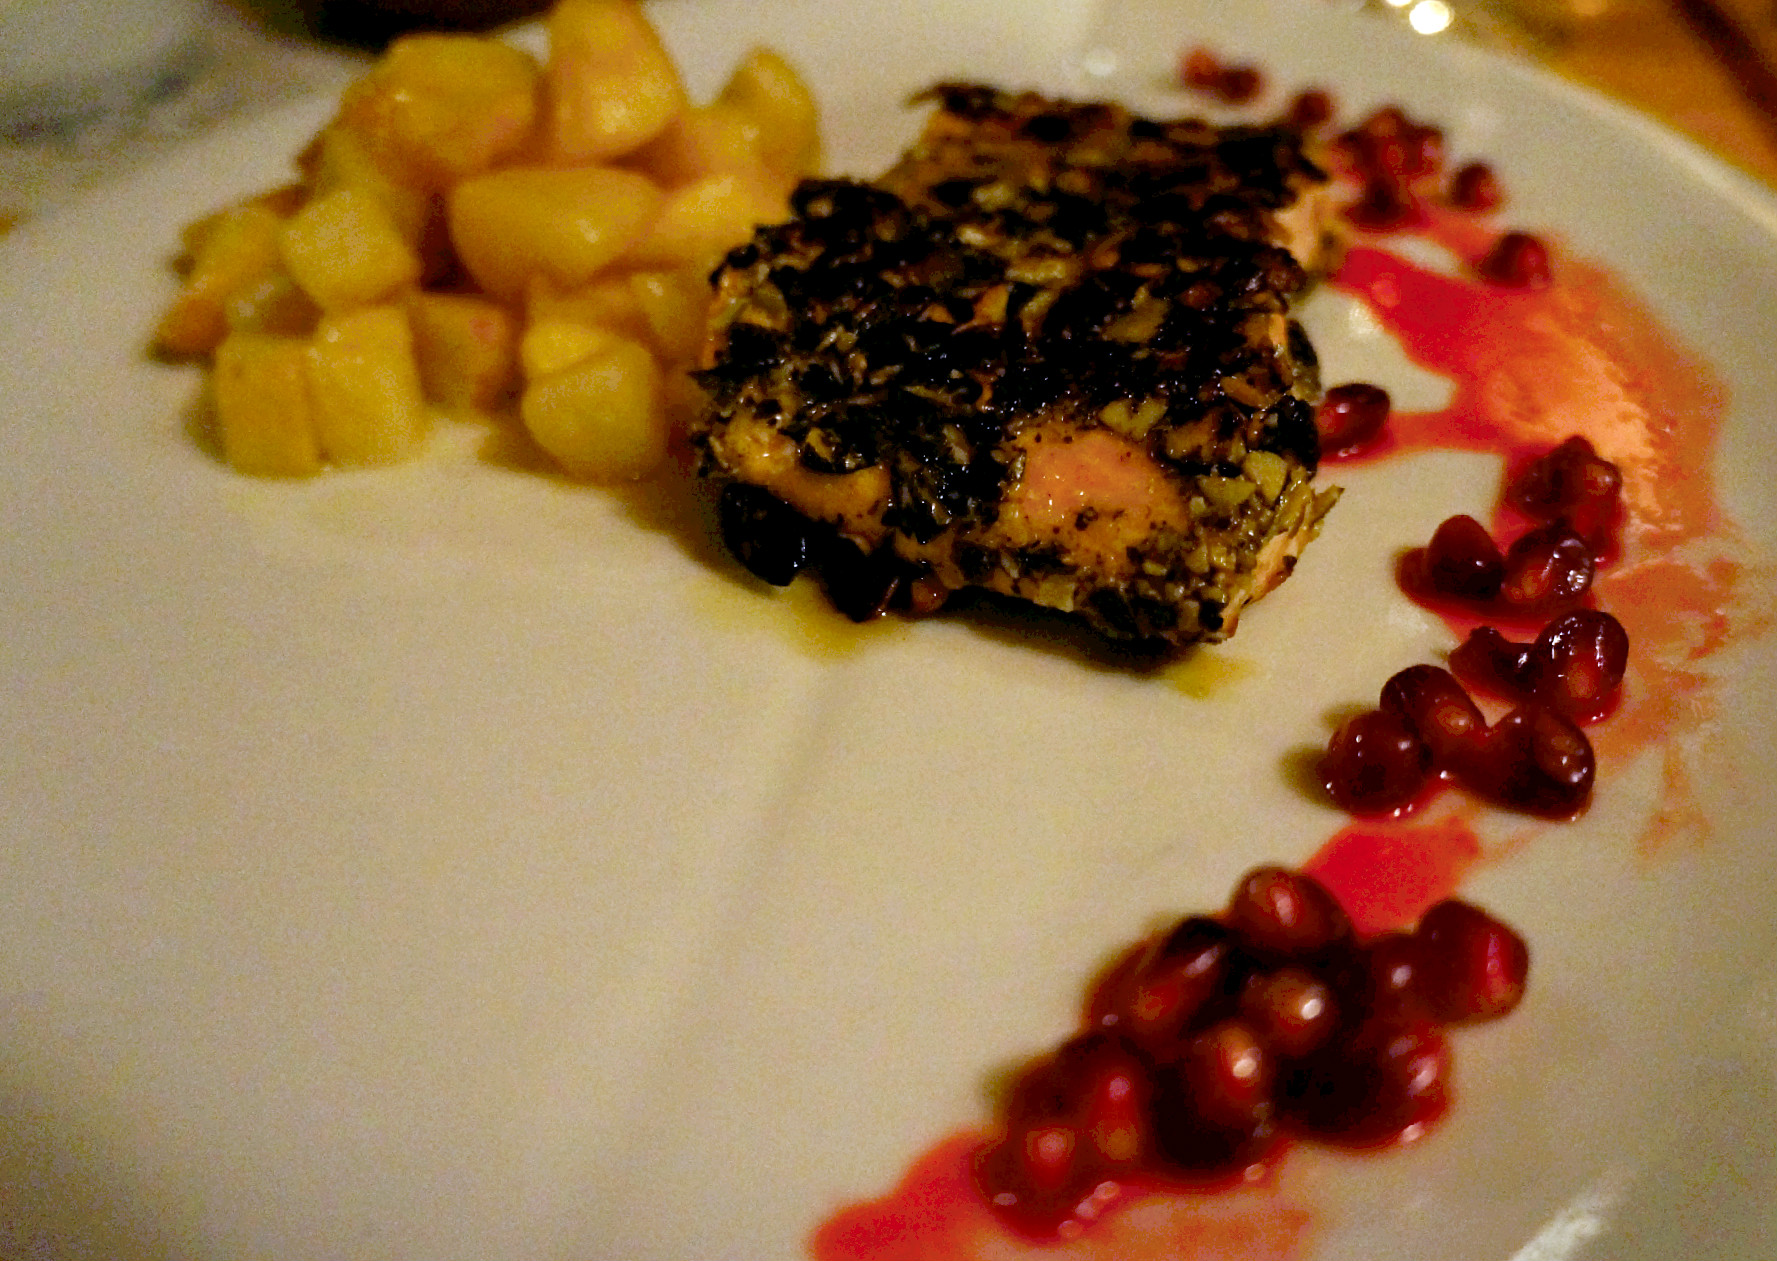 file lososa pržen na golici, jabuka i celer, sos od nara